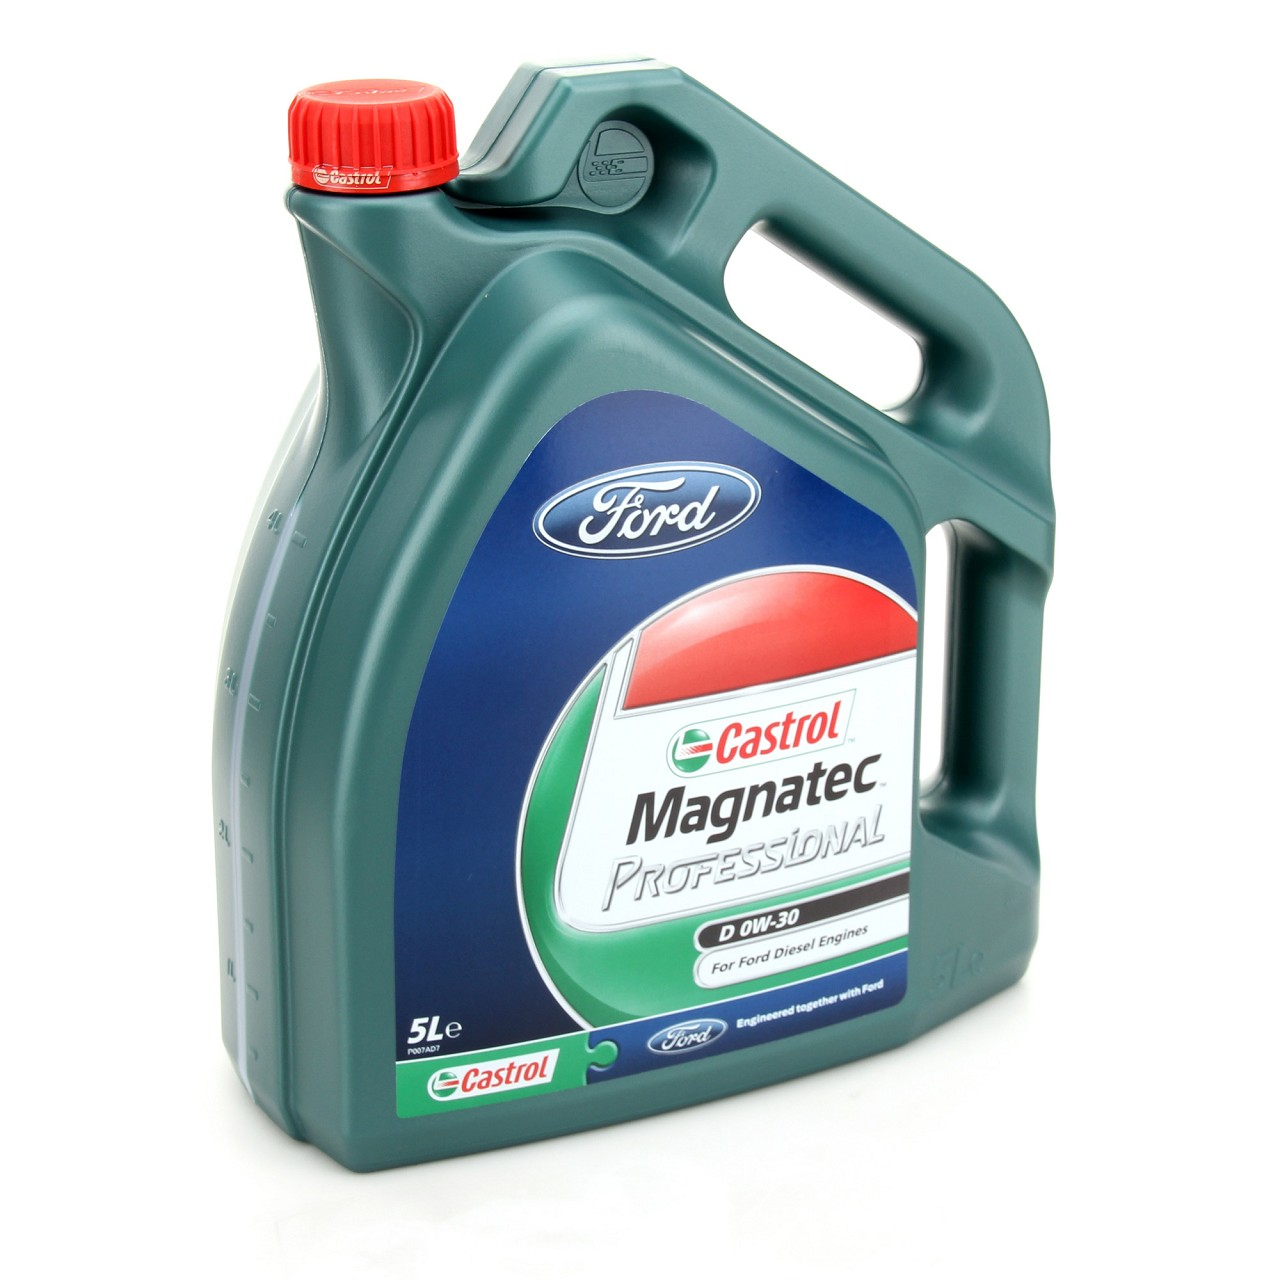 ORIGINAL Ford CASTROL Motoröl Öl D 0W30 Magnatec Professional 5 Liter 5L 157C37